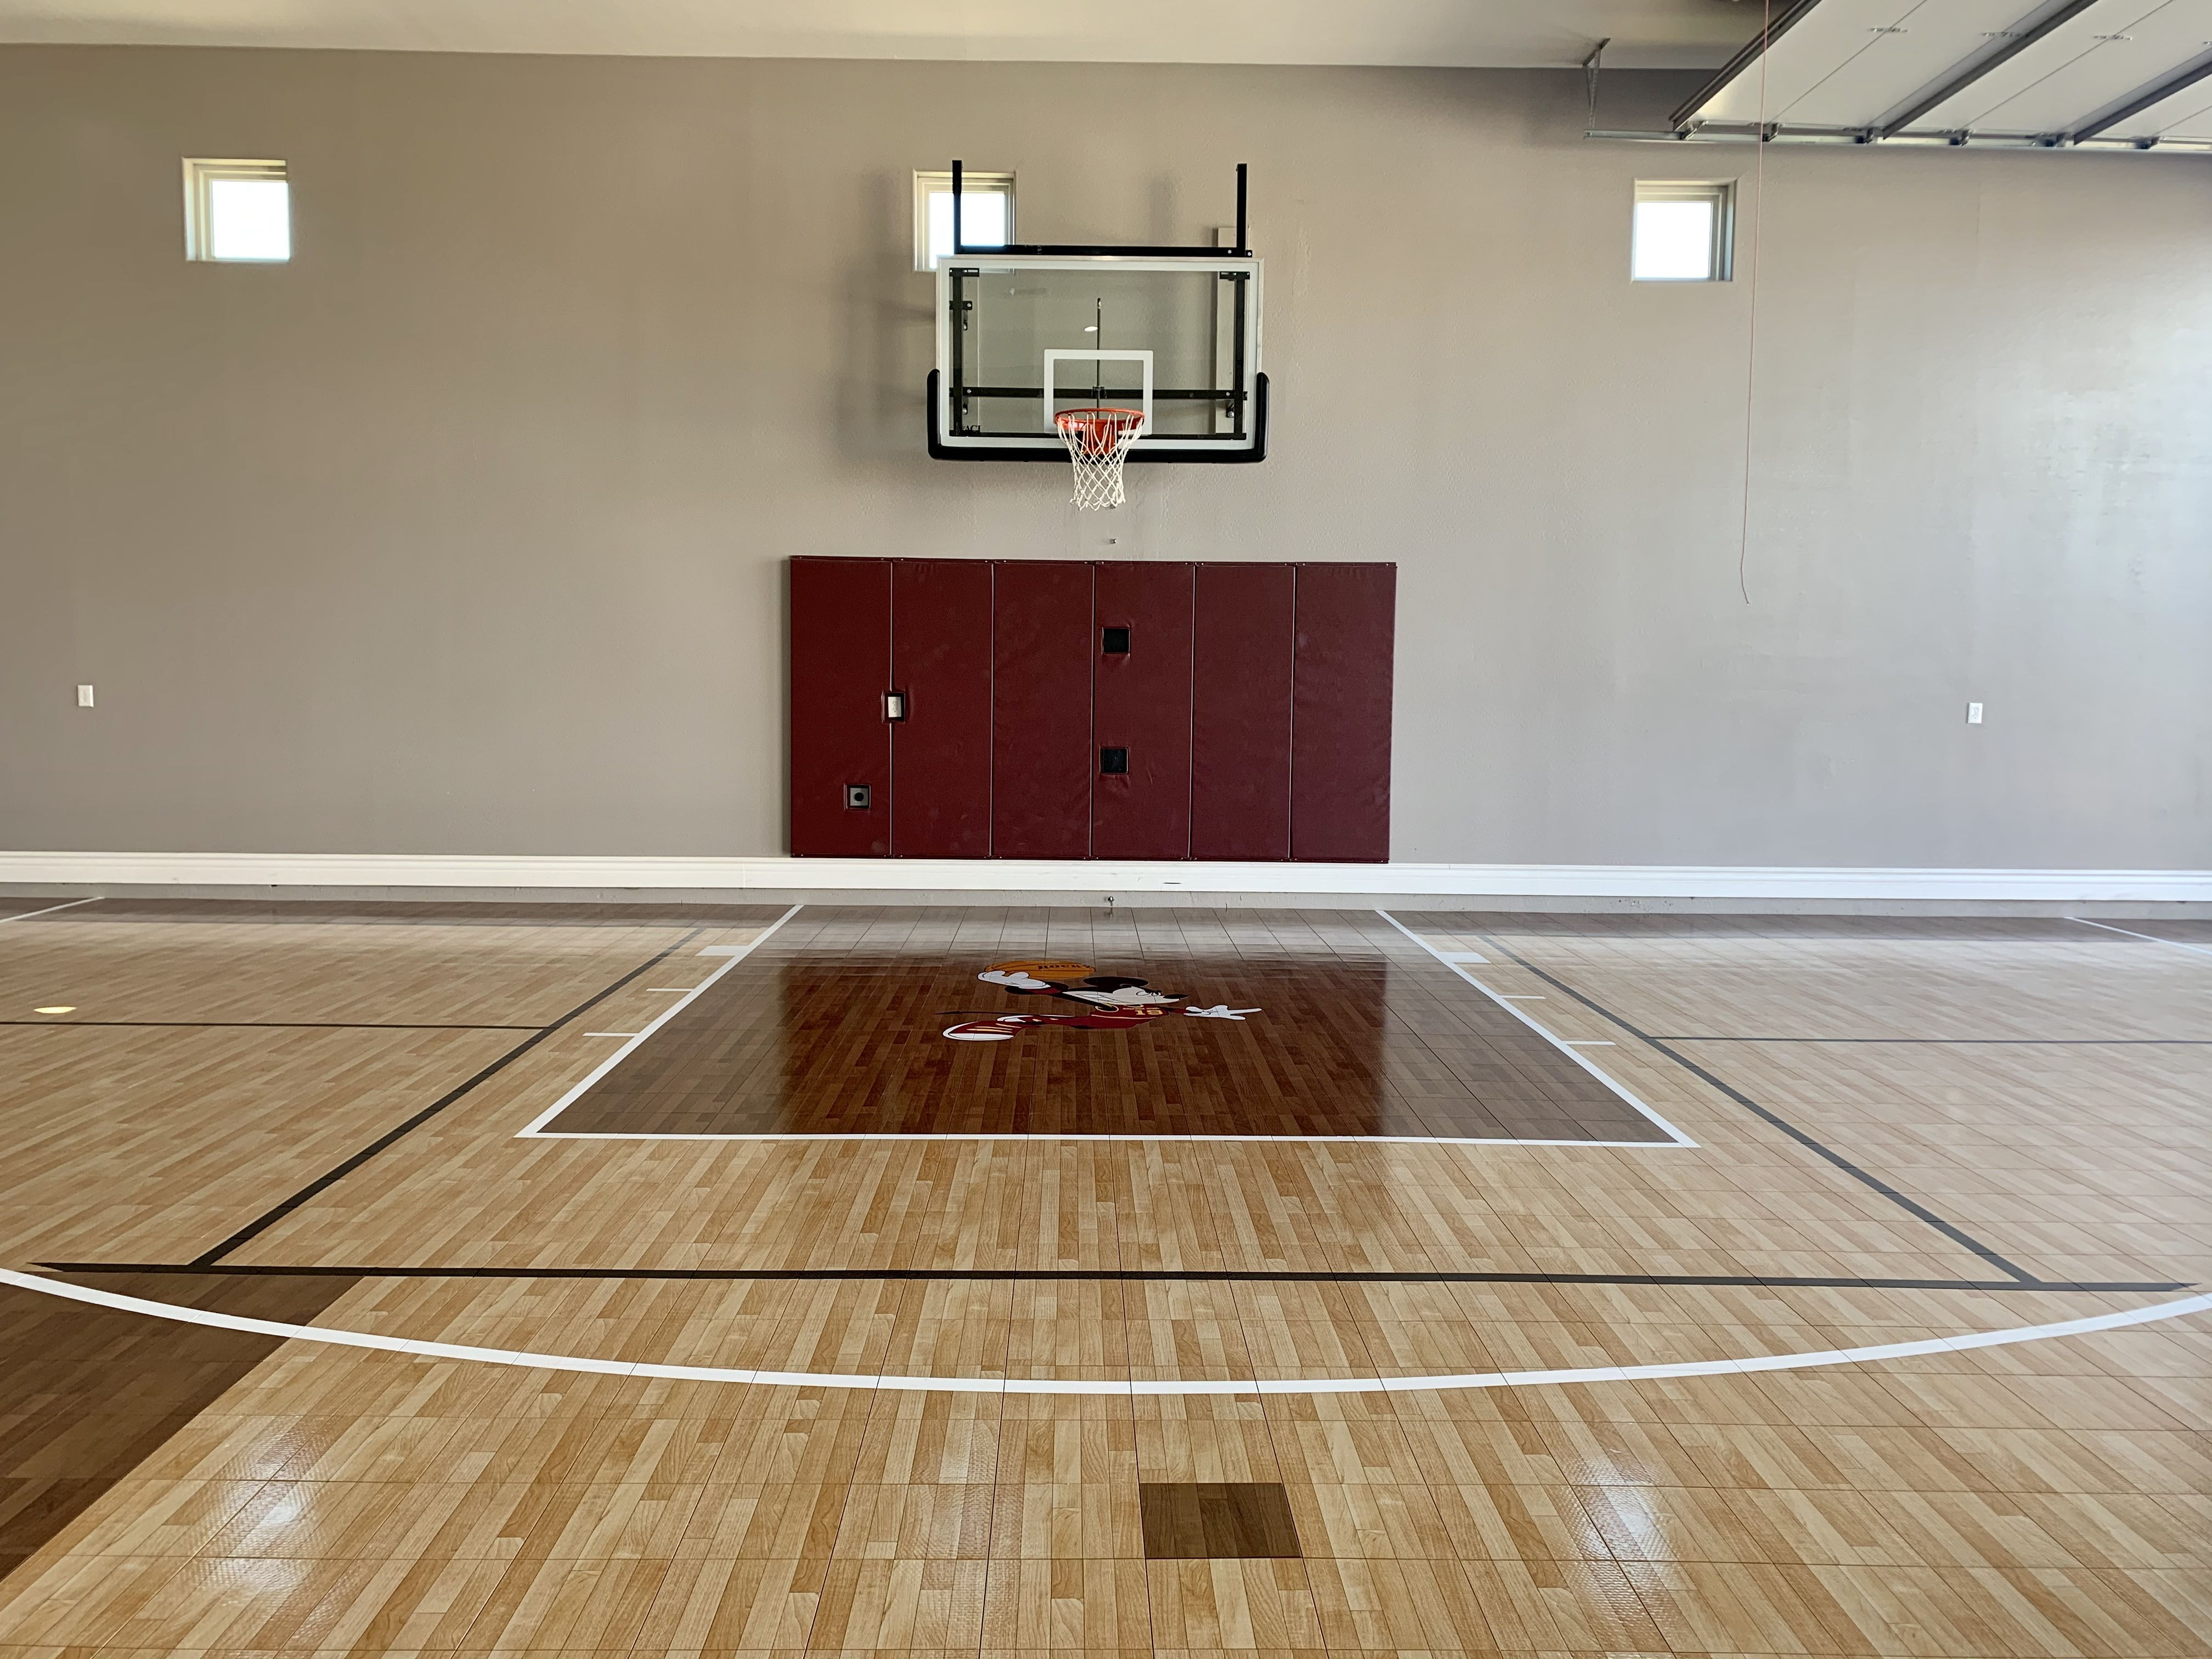 Indoor Basketball Court Backyard Guest Houses Dream House Indoor Basketball Court